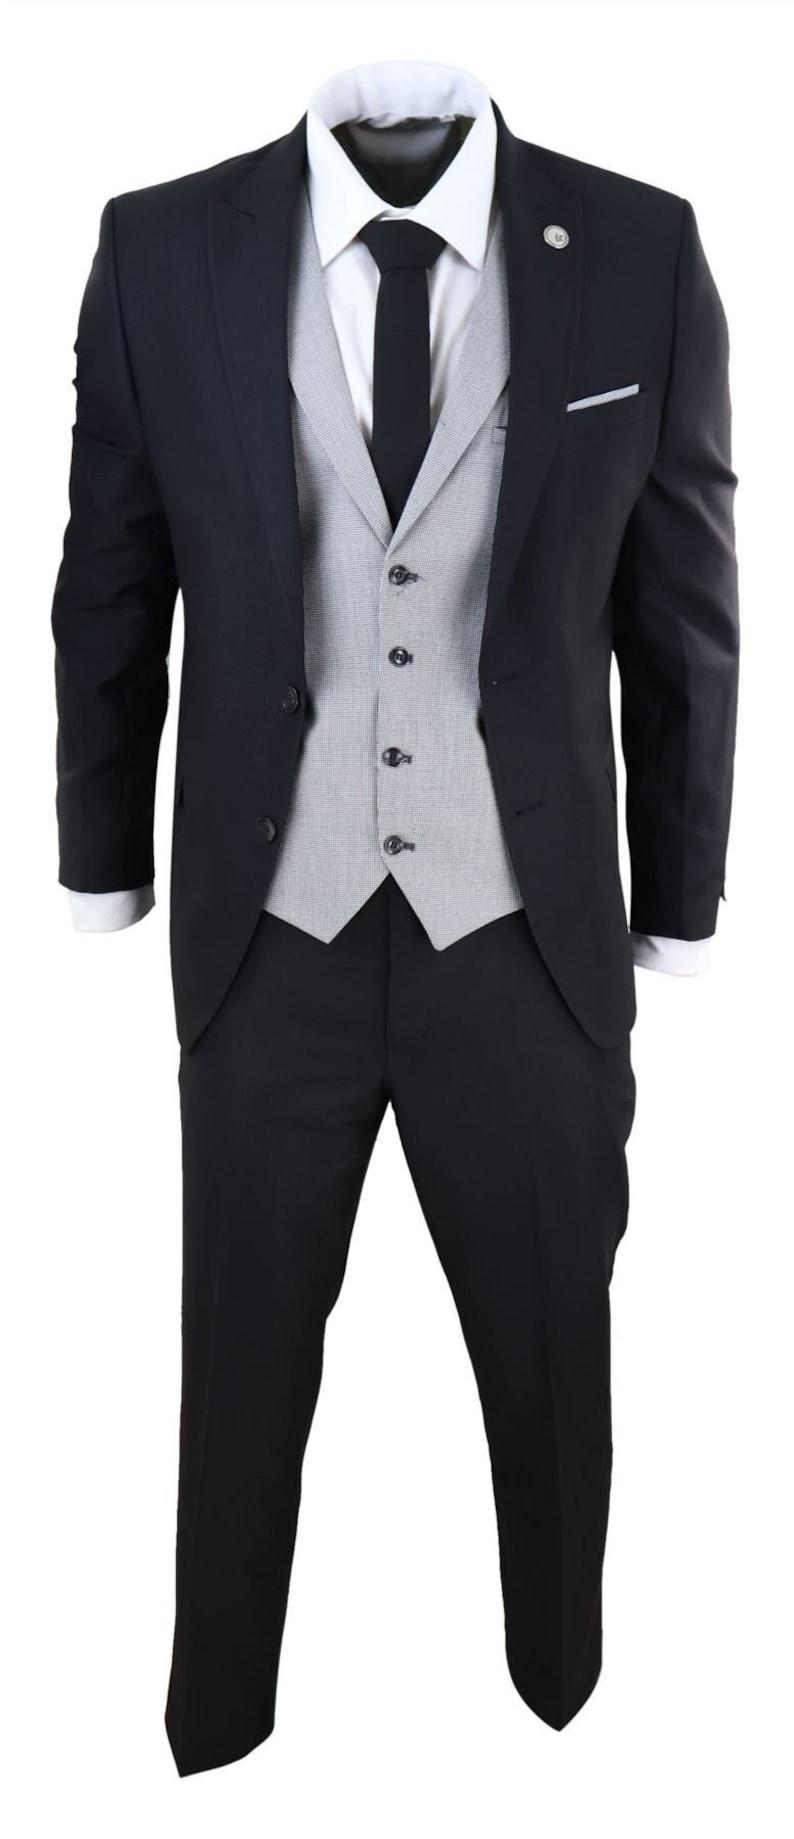 Men's Vintage Clothing | Retro Clothing for Men     Mens 3 piece tweed herringbone  vintage 1920s gatsby suit black $173.12 AT vintagedancer.com